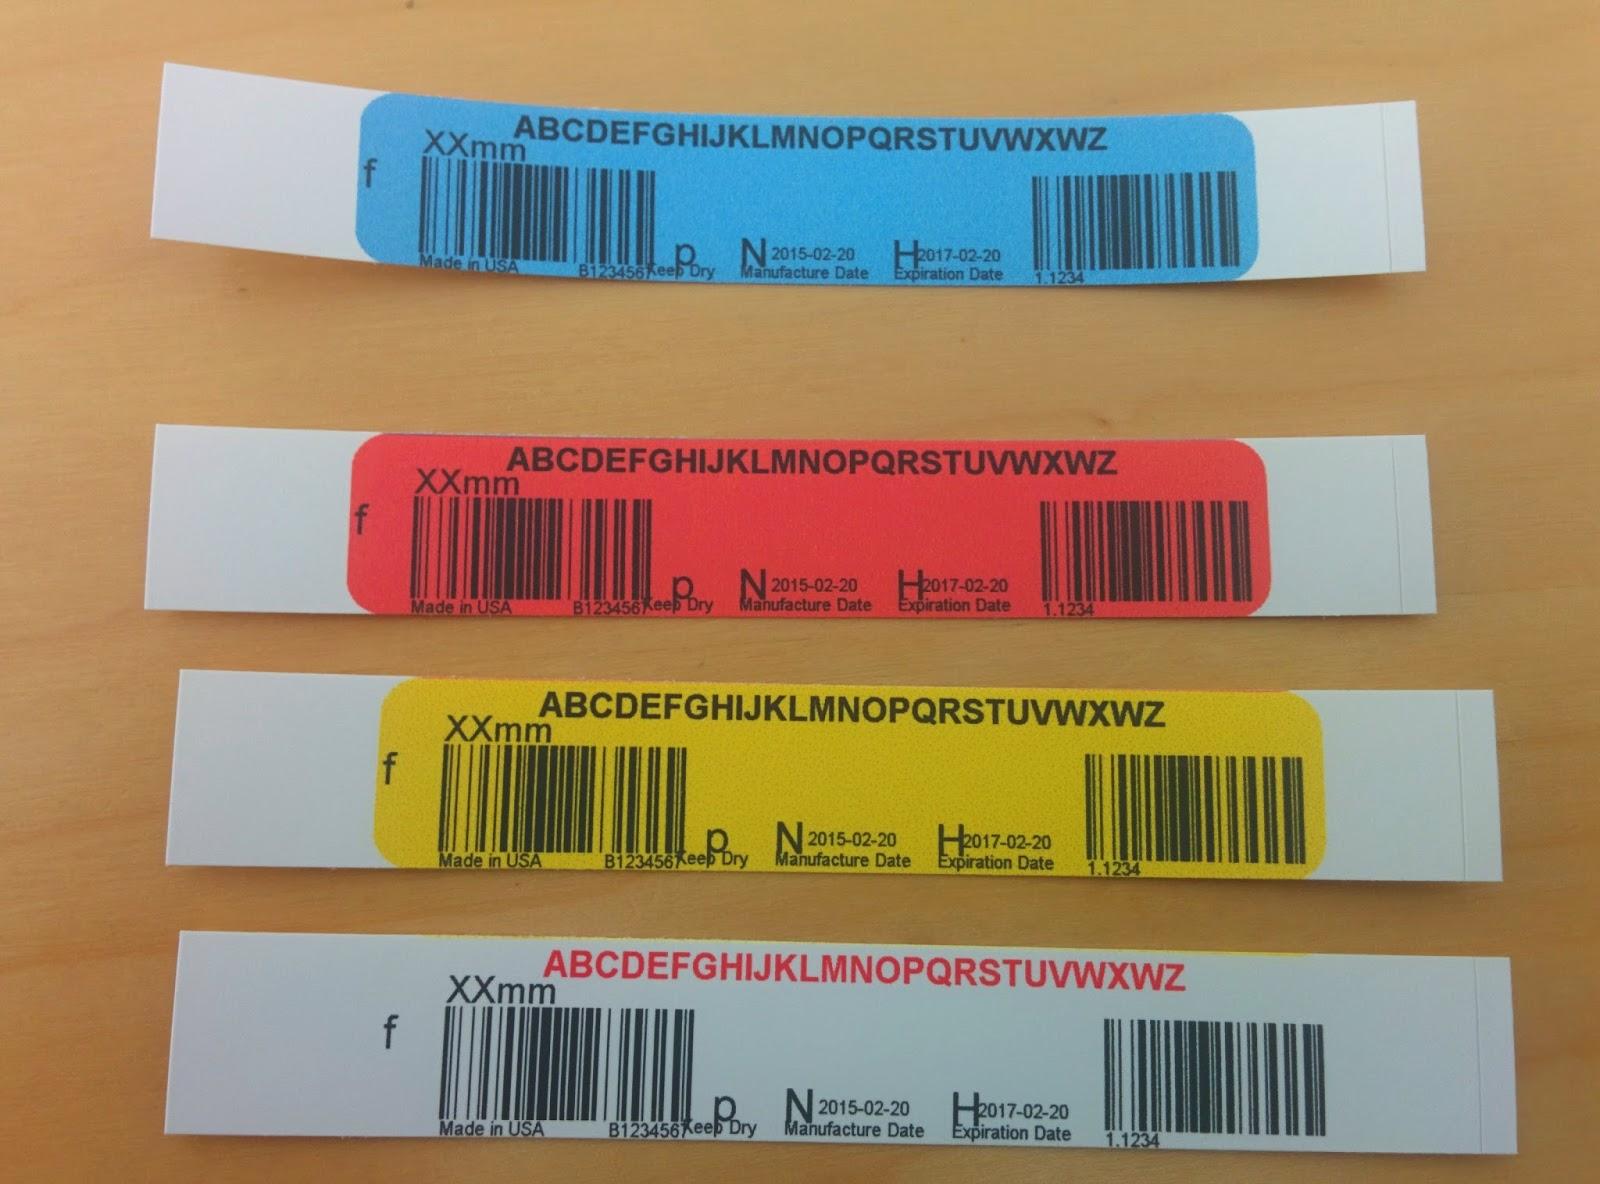 TM-C3500 Printing Barcodes